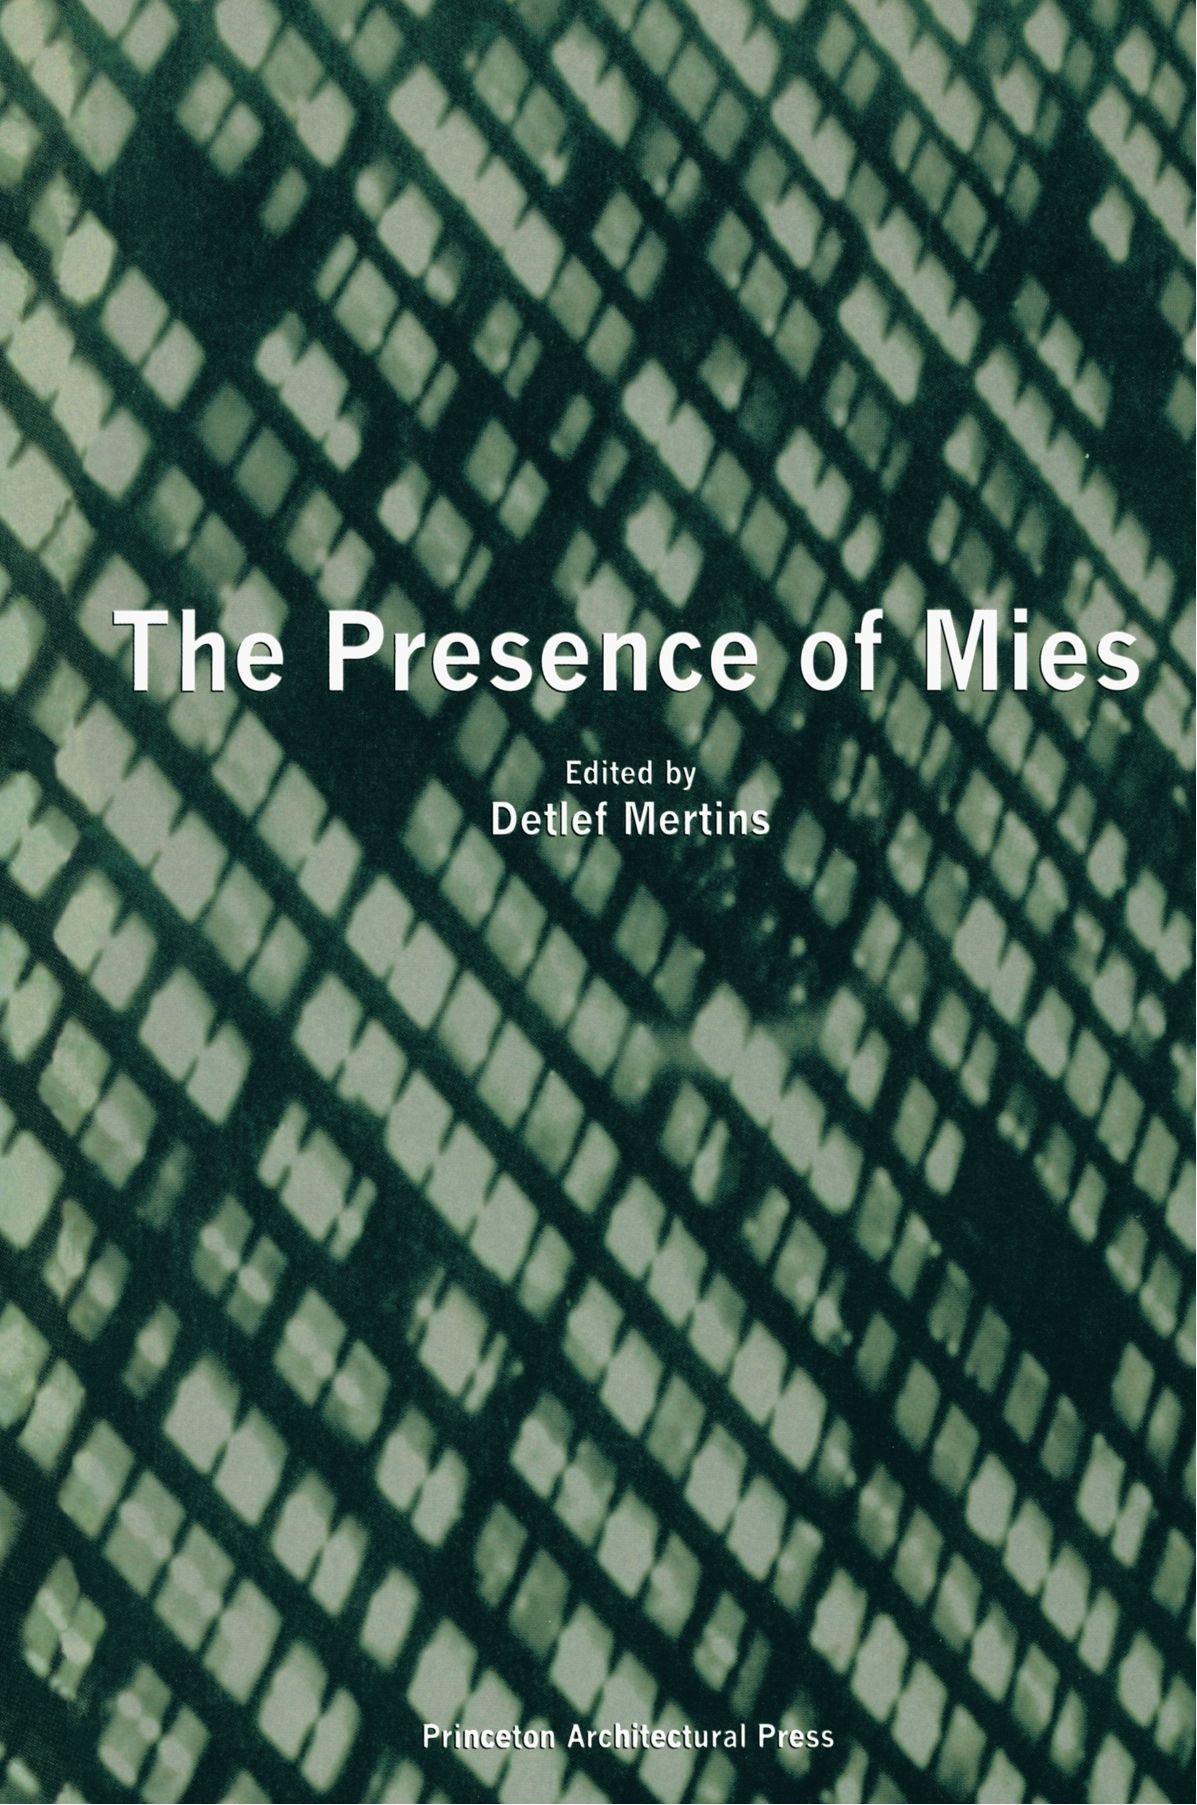 amazon the presence of mies detlef mertins individual